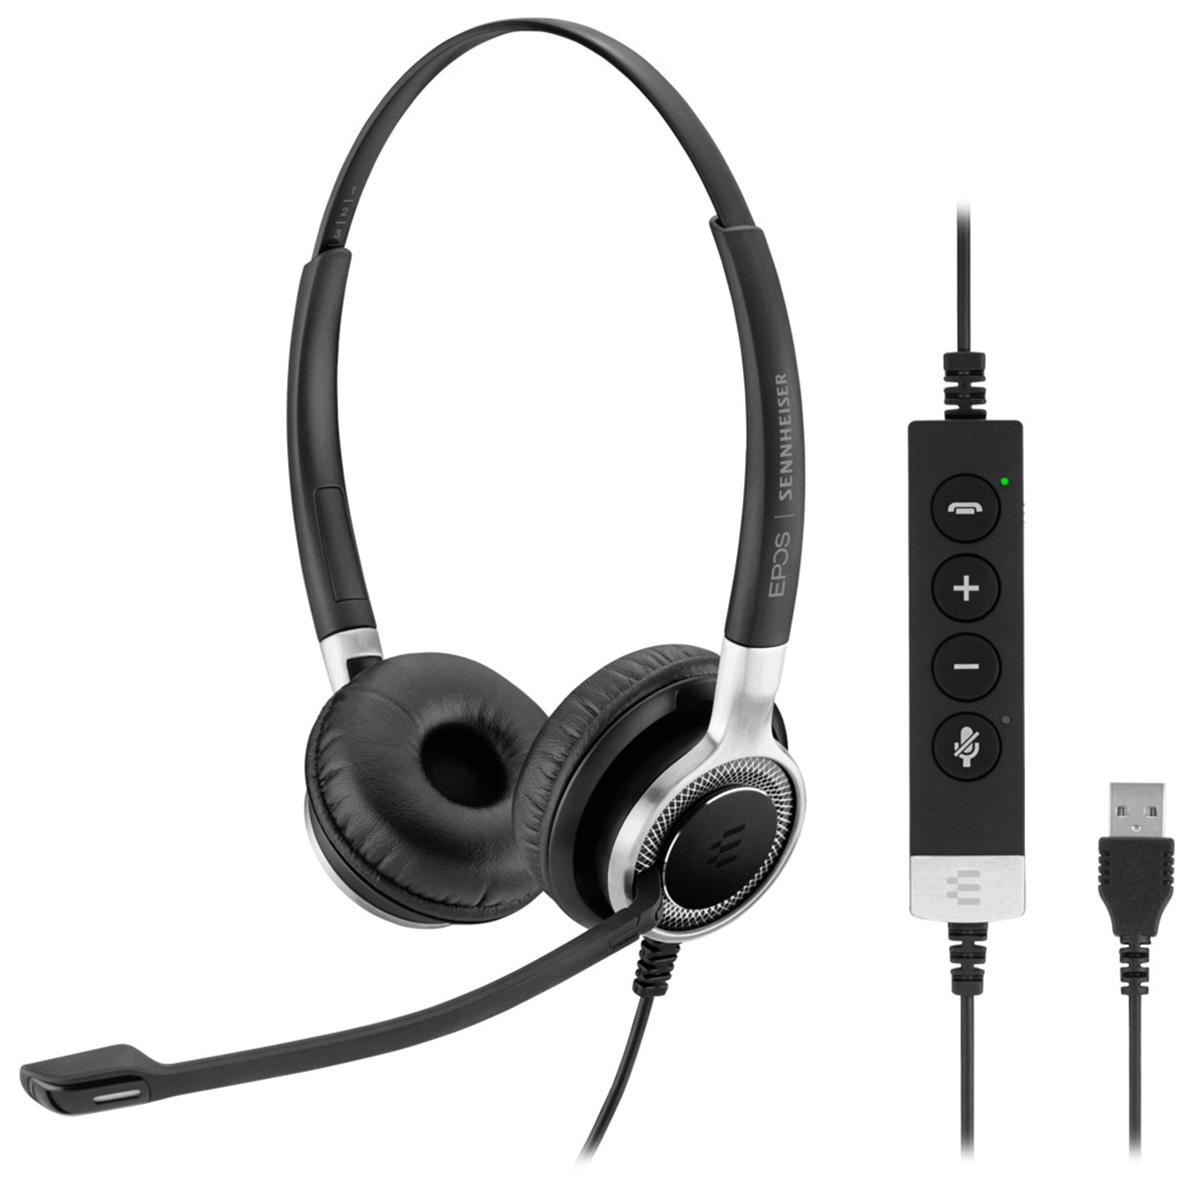 EPOS Sennheiser SC660 USB ANC Stereo Headset